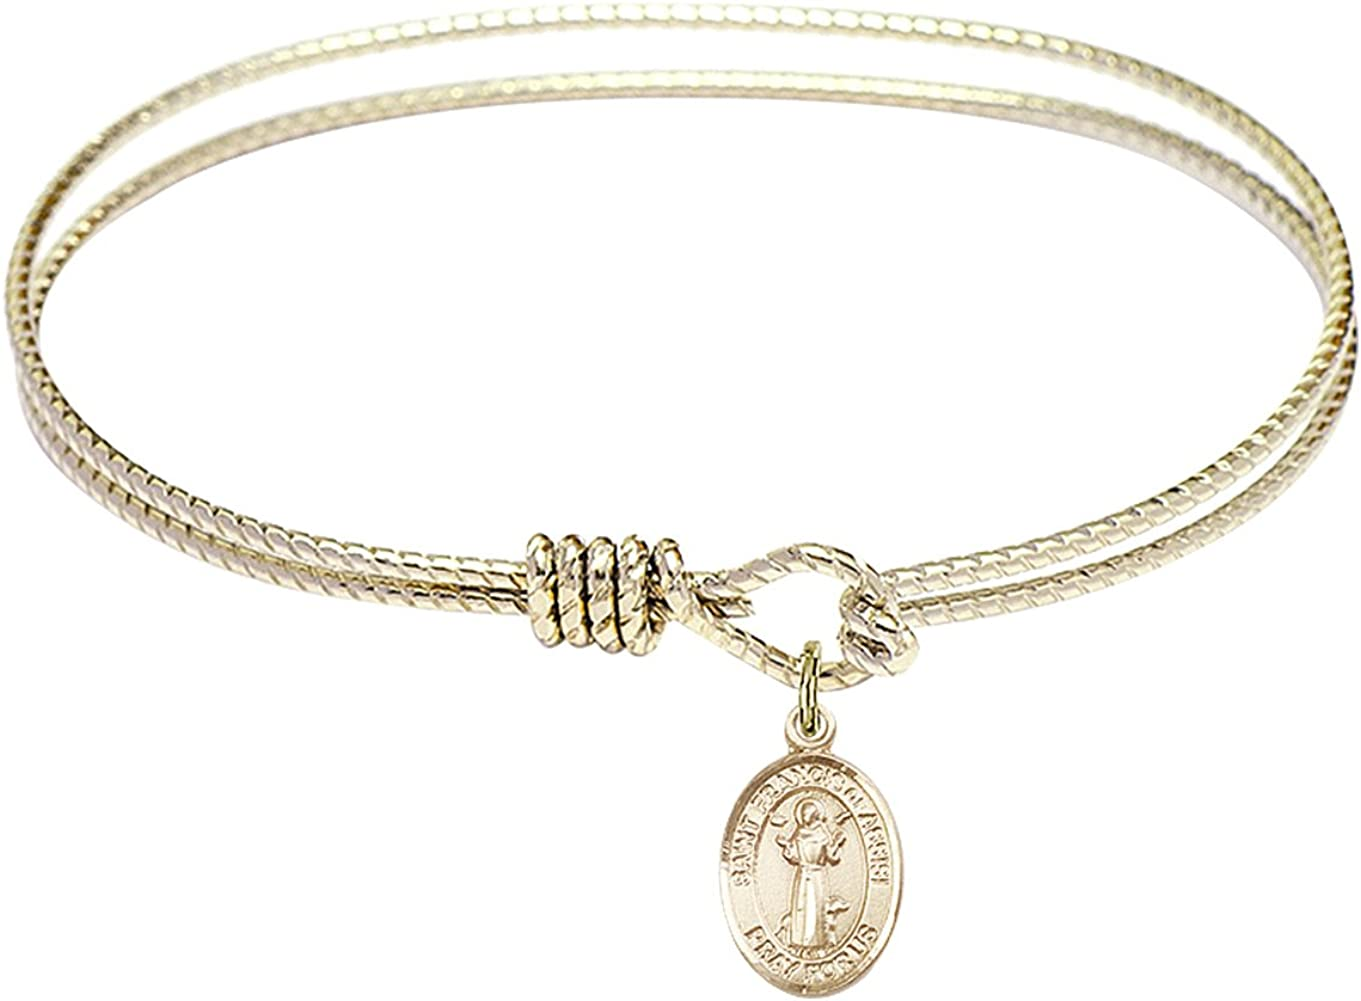 DiamondJewelryNY Eye Hook Bangle Bracelet with a St. Francis of